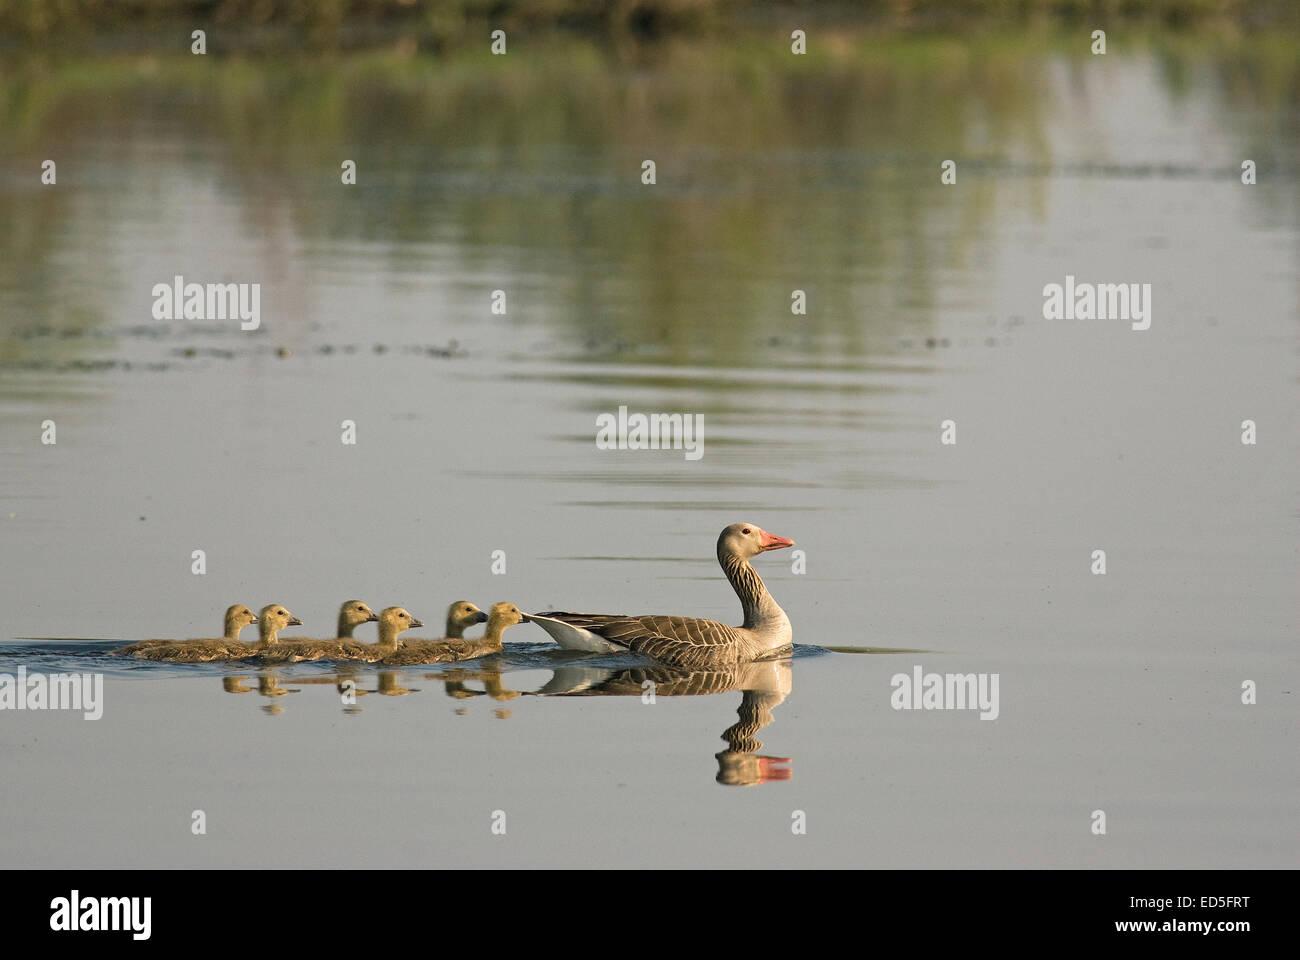 Greylag goose (Anser anser) with fledglings, Danube delta, Romania, Europa - Stock Image